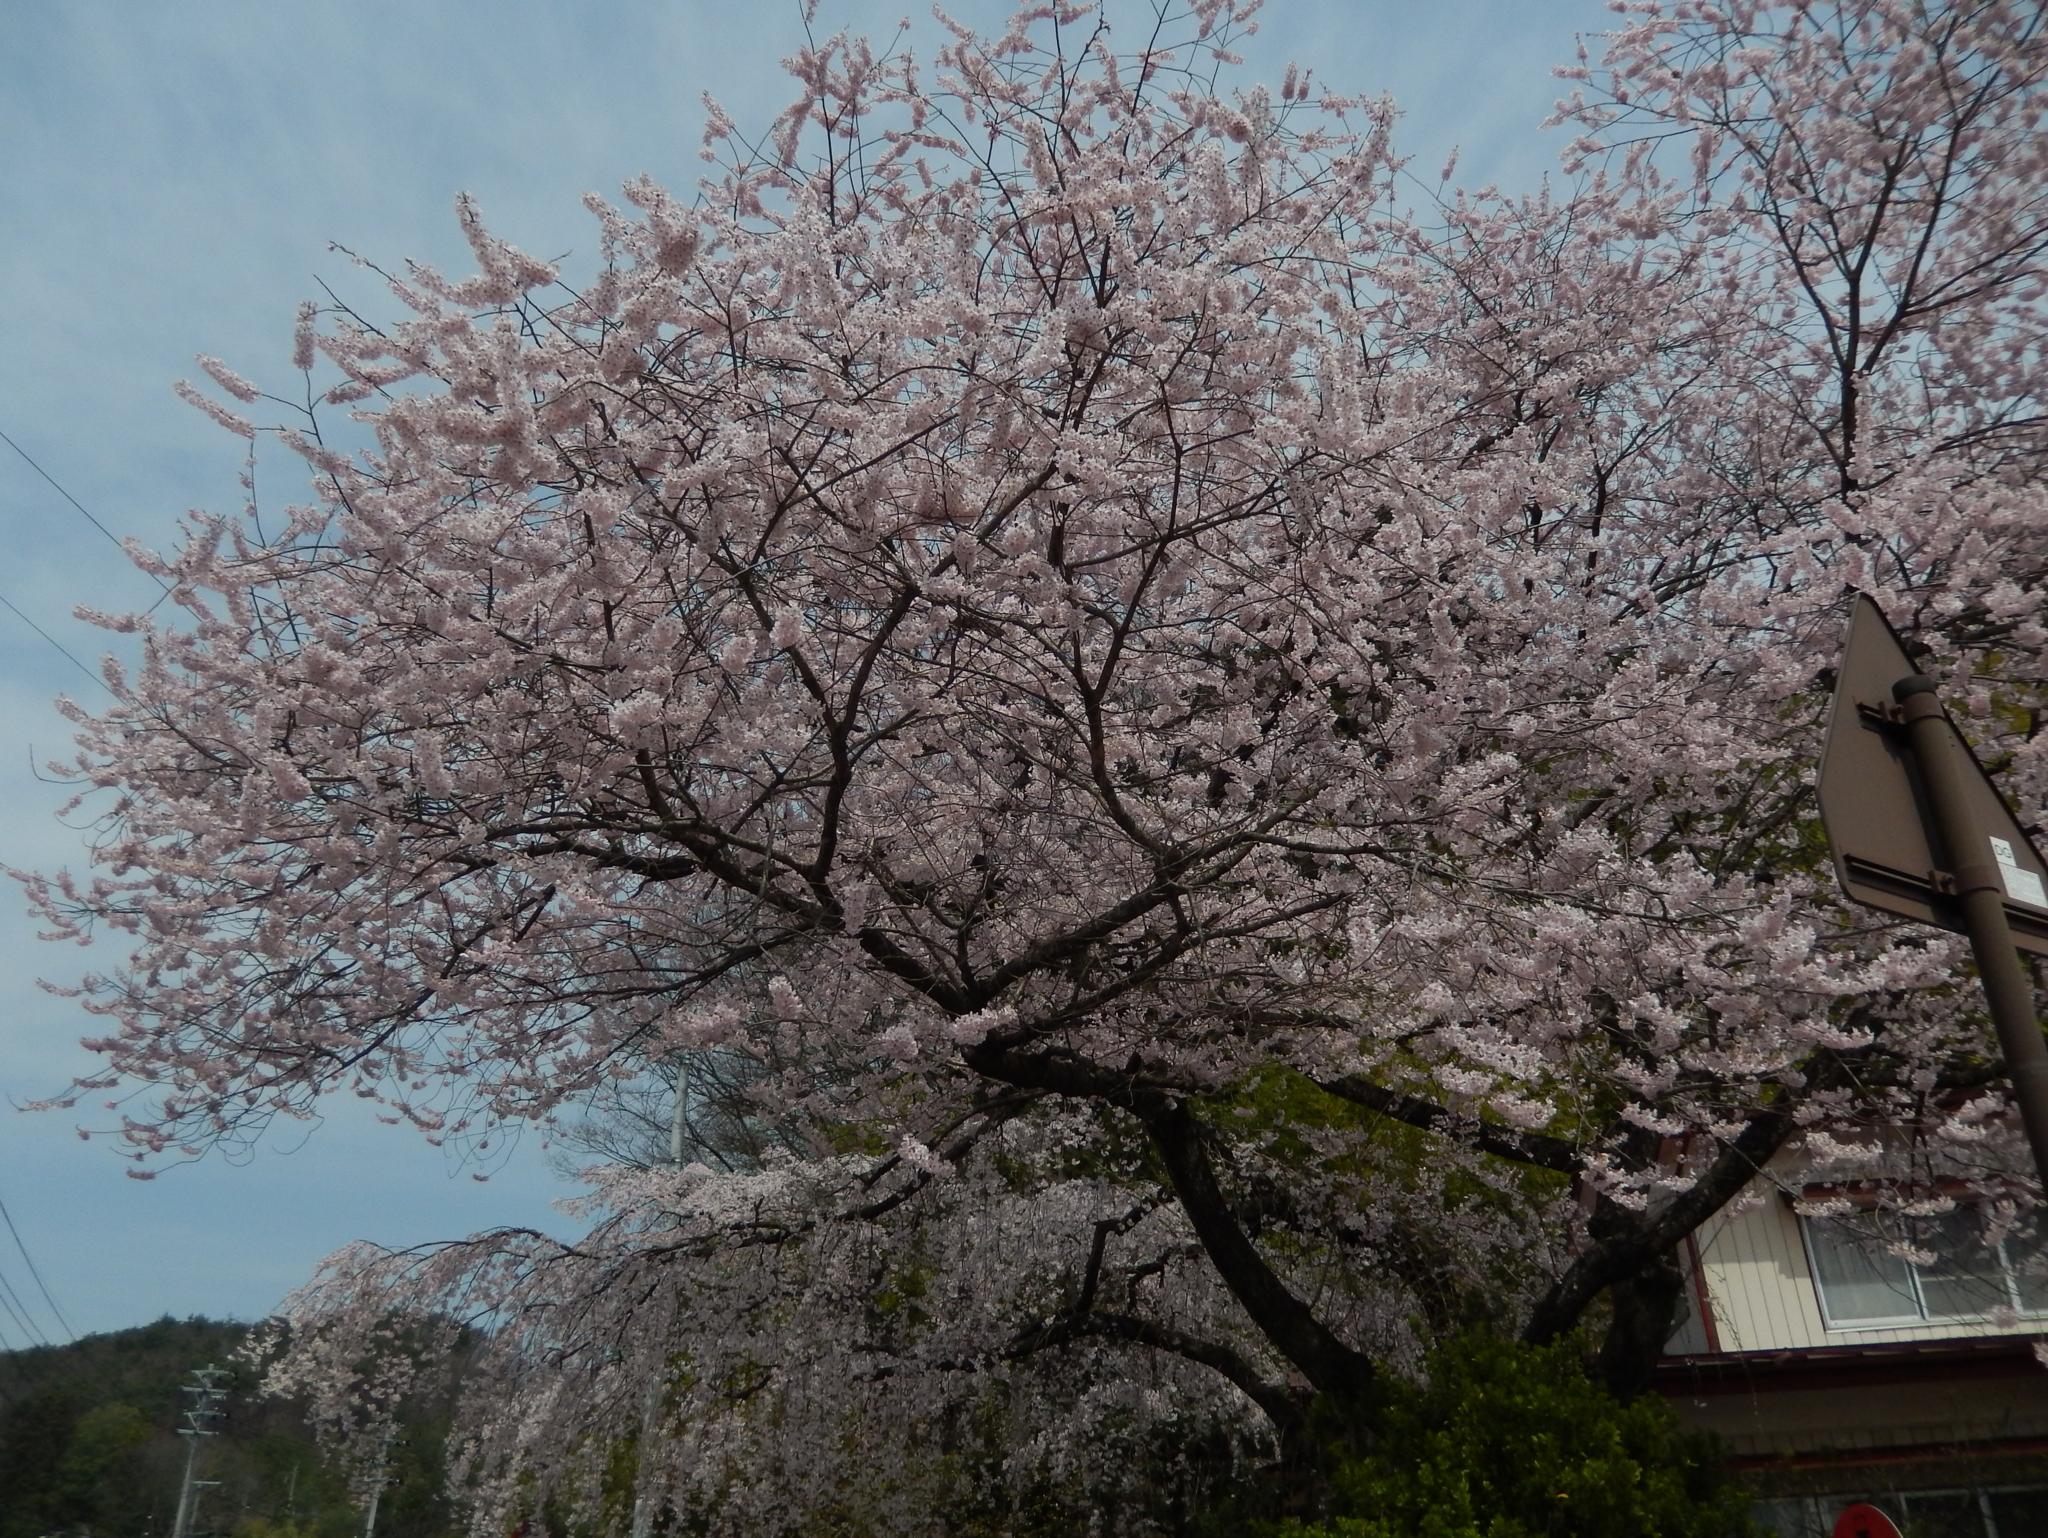 f:id:ToshUeno:20160409105750j:plain